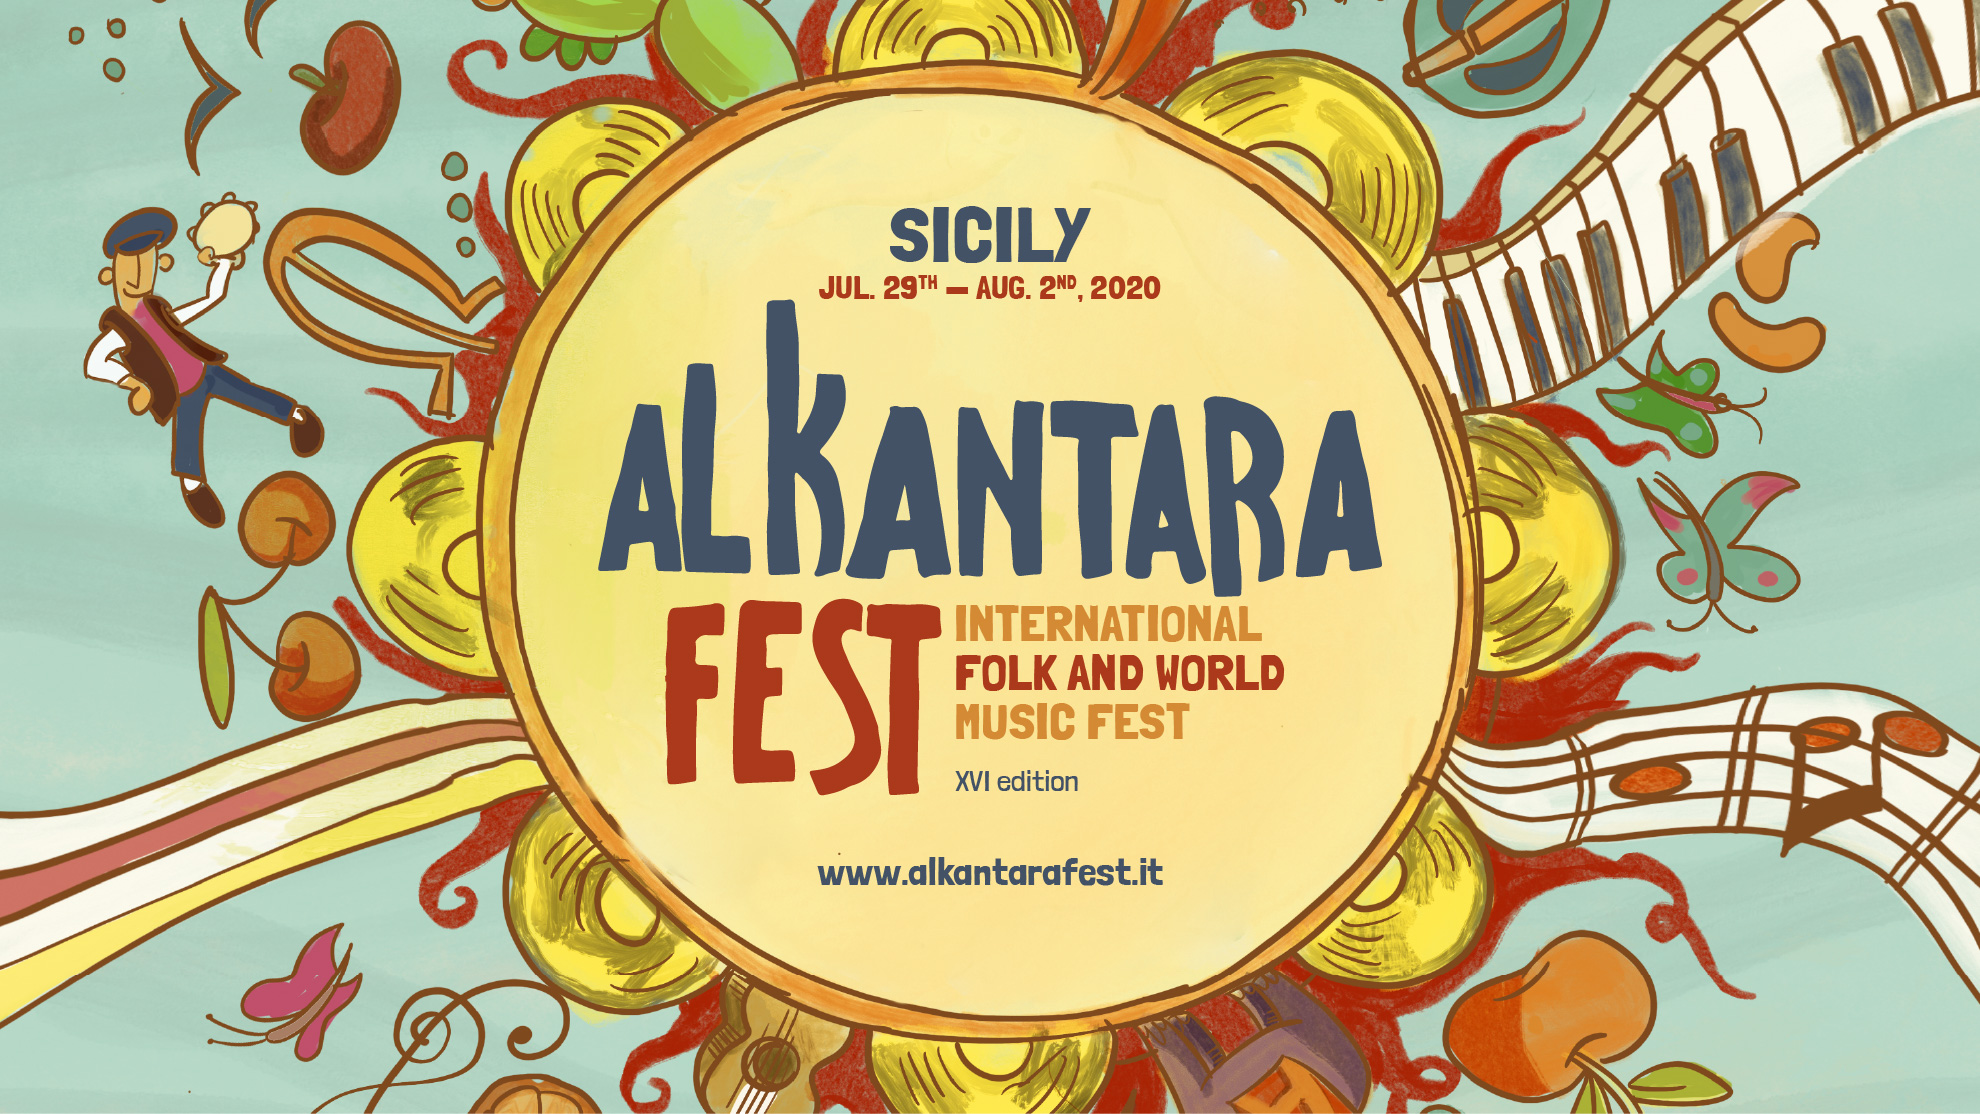 29 lug/2 ago – Ritorna ALKANTARA FEST sull'Etna